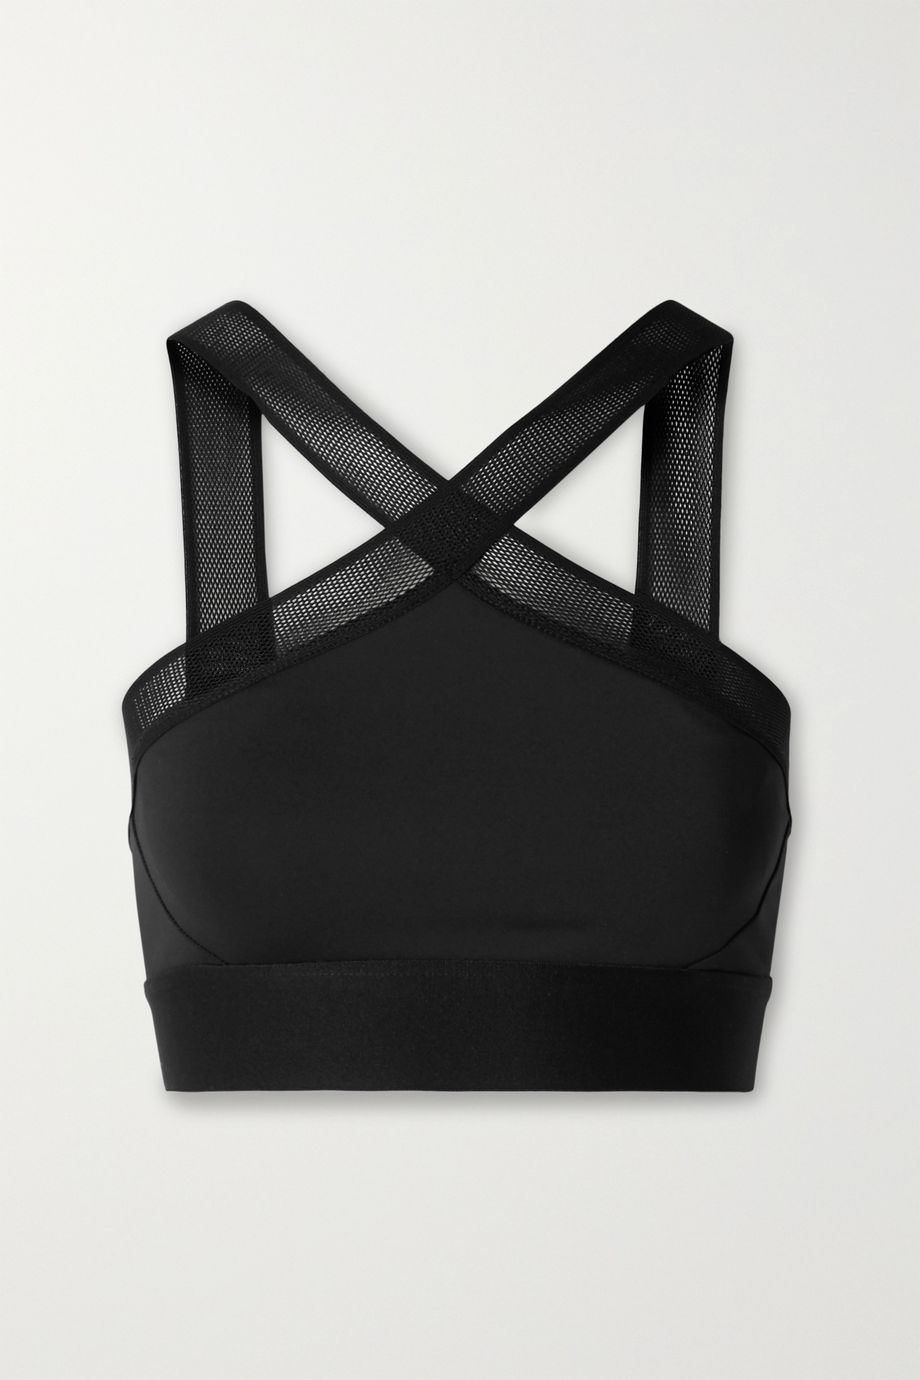 Heroine Sport X mesh-trimmed stretch sports bra